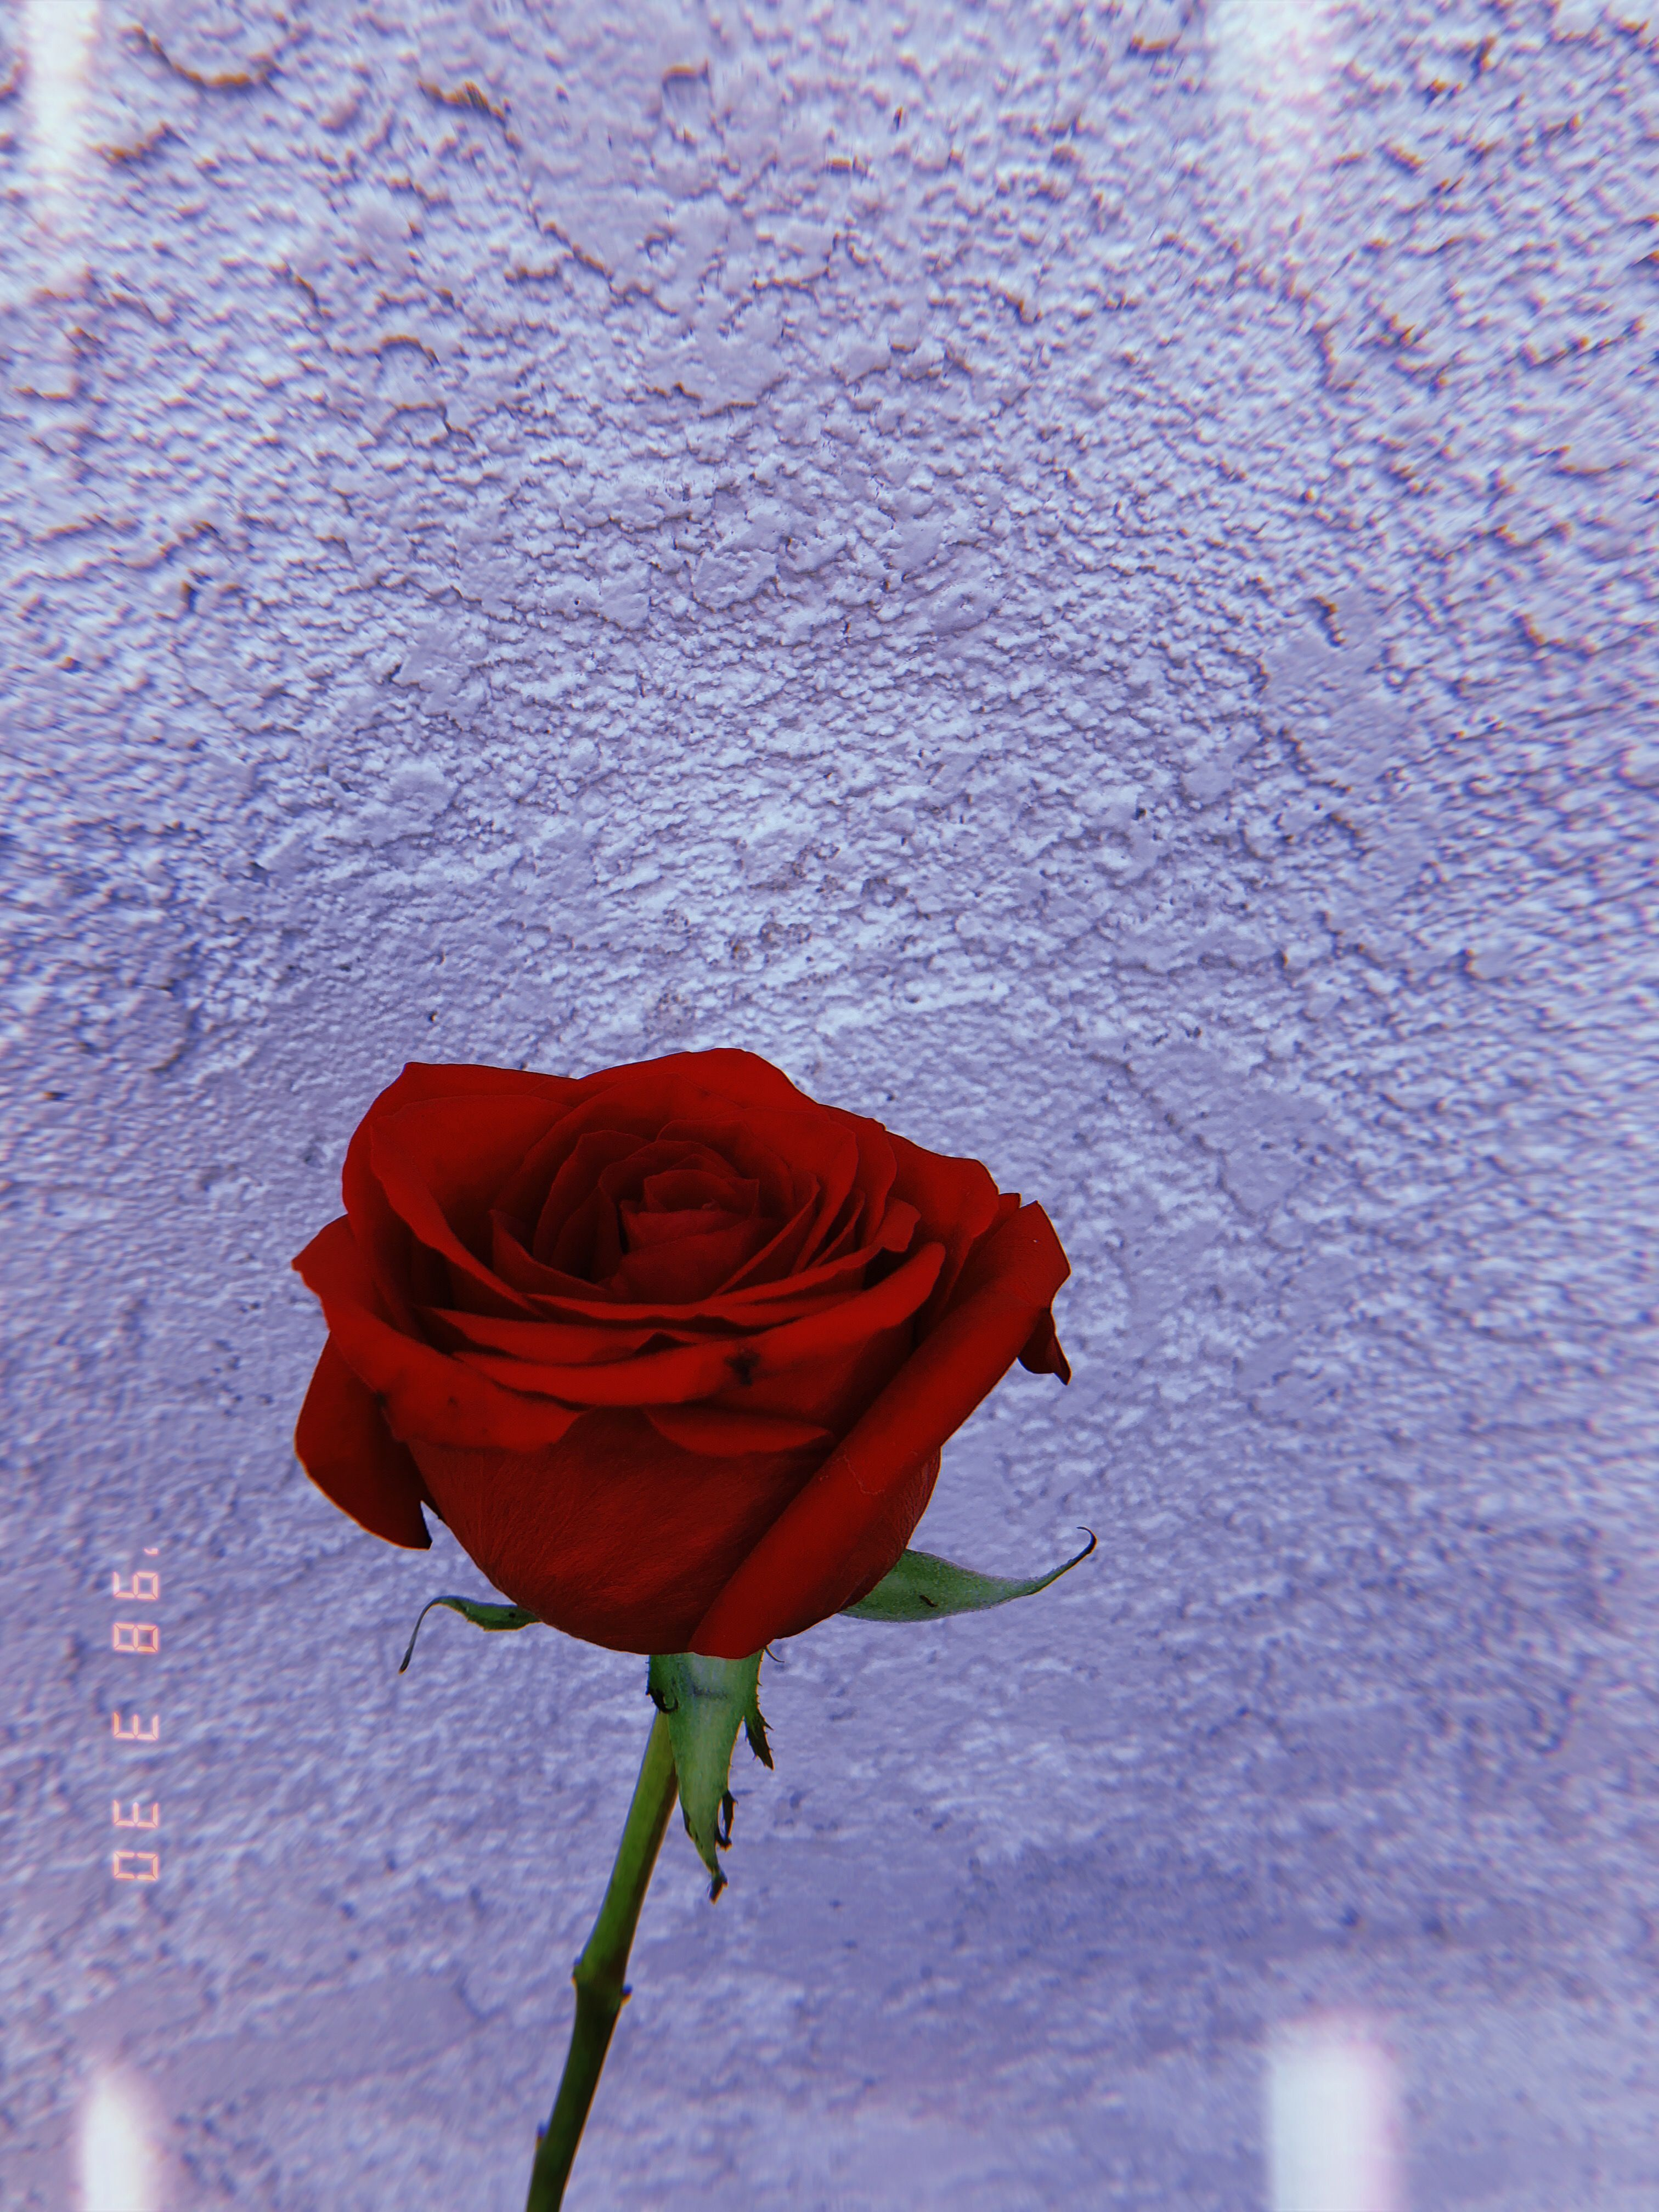 Pin by Giancarlo Co on boy's rose Rose wallpaper